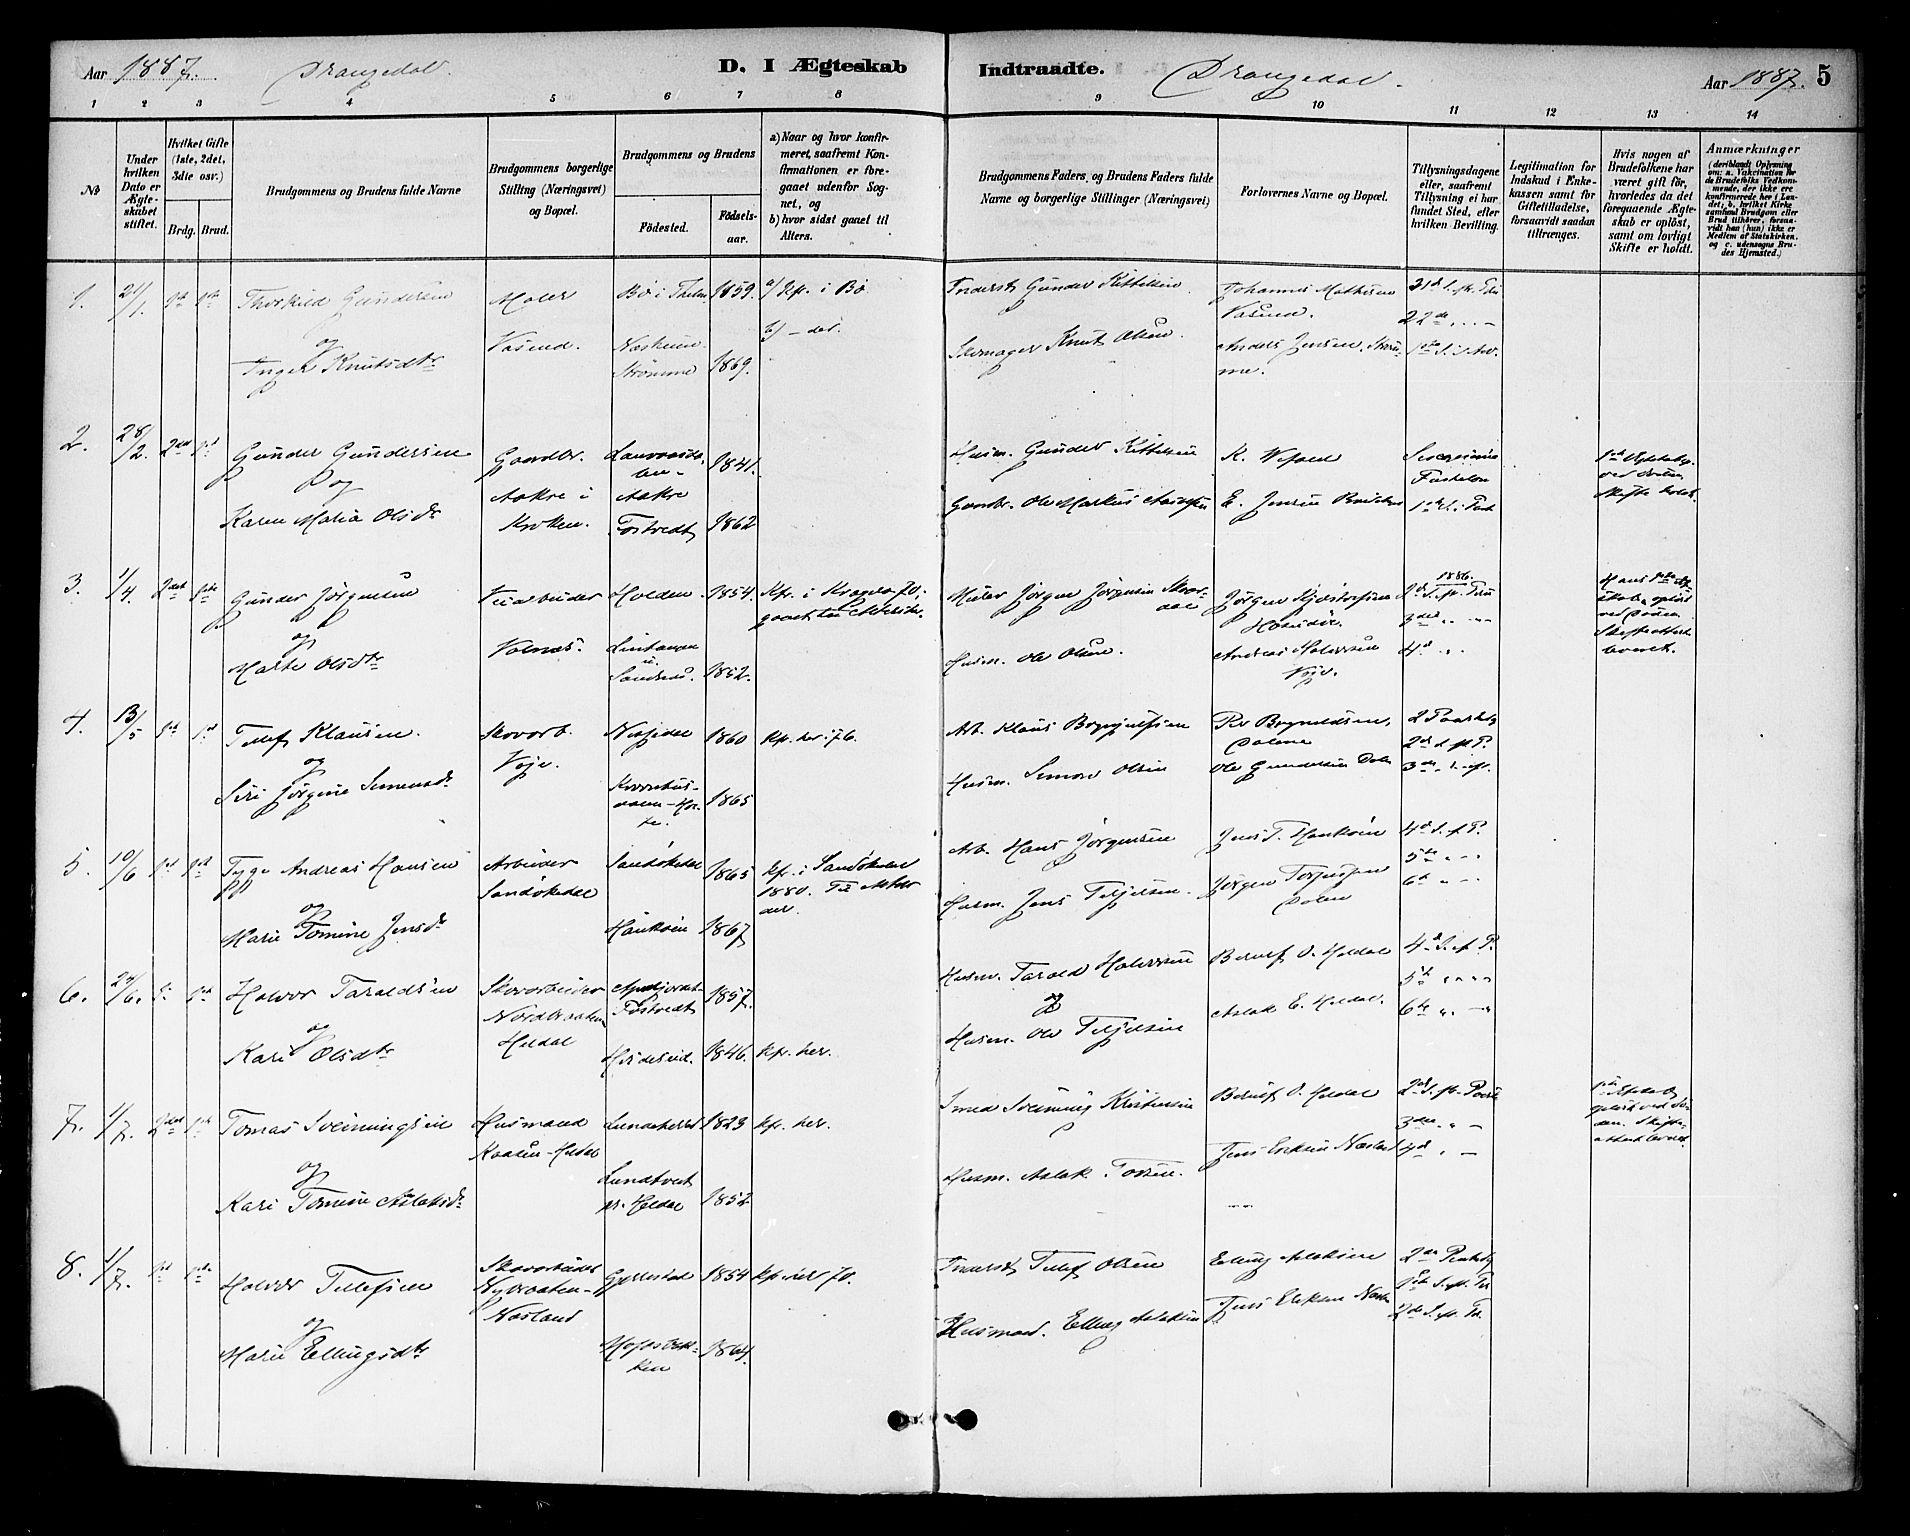 SAKO, Drangedal kirkebøker, F/Fa/L0011: Ministerialbok nr. 11 /1, 1885-1894, s. 5